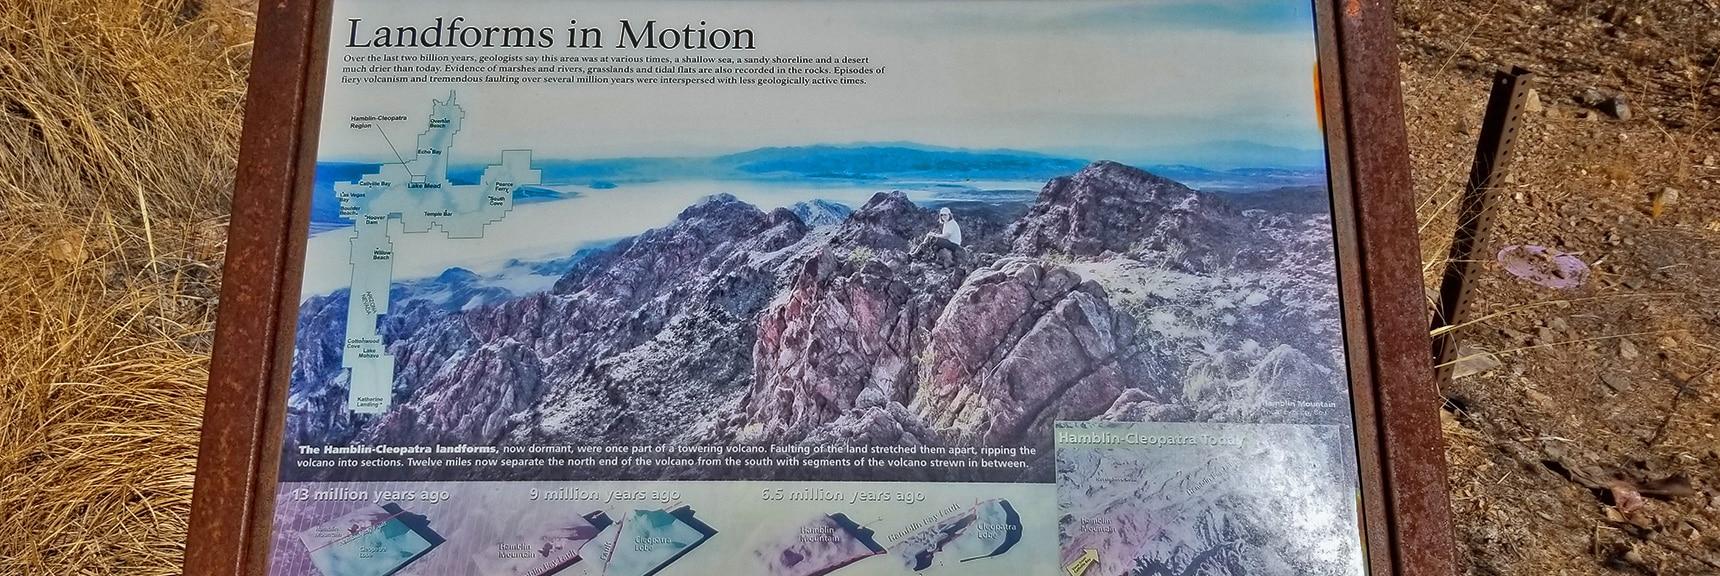 Interpretive Display of Geological Activity in Hamblin Mountain Area   Callville Summit Trail   Lake Mead National Recreation Area, Nevada